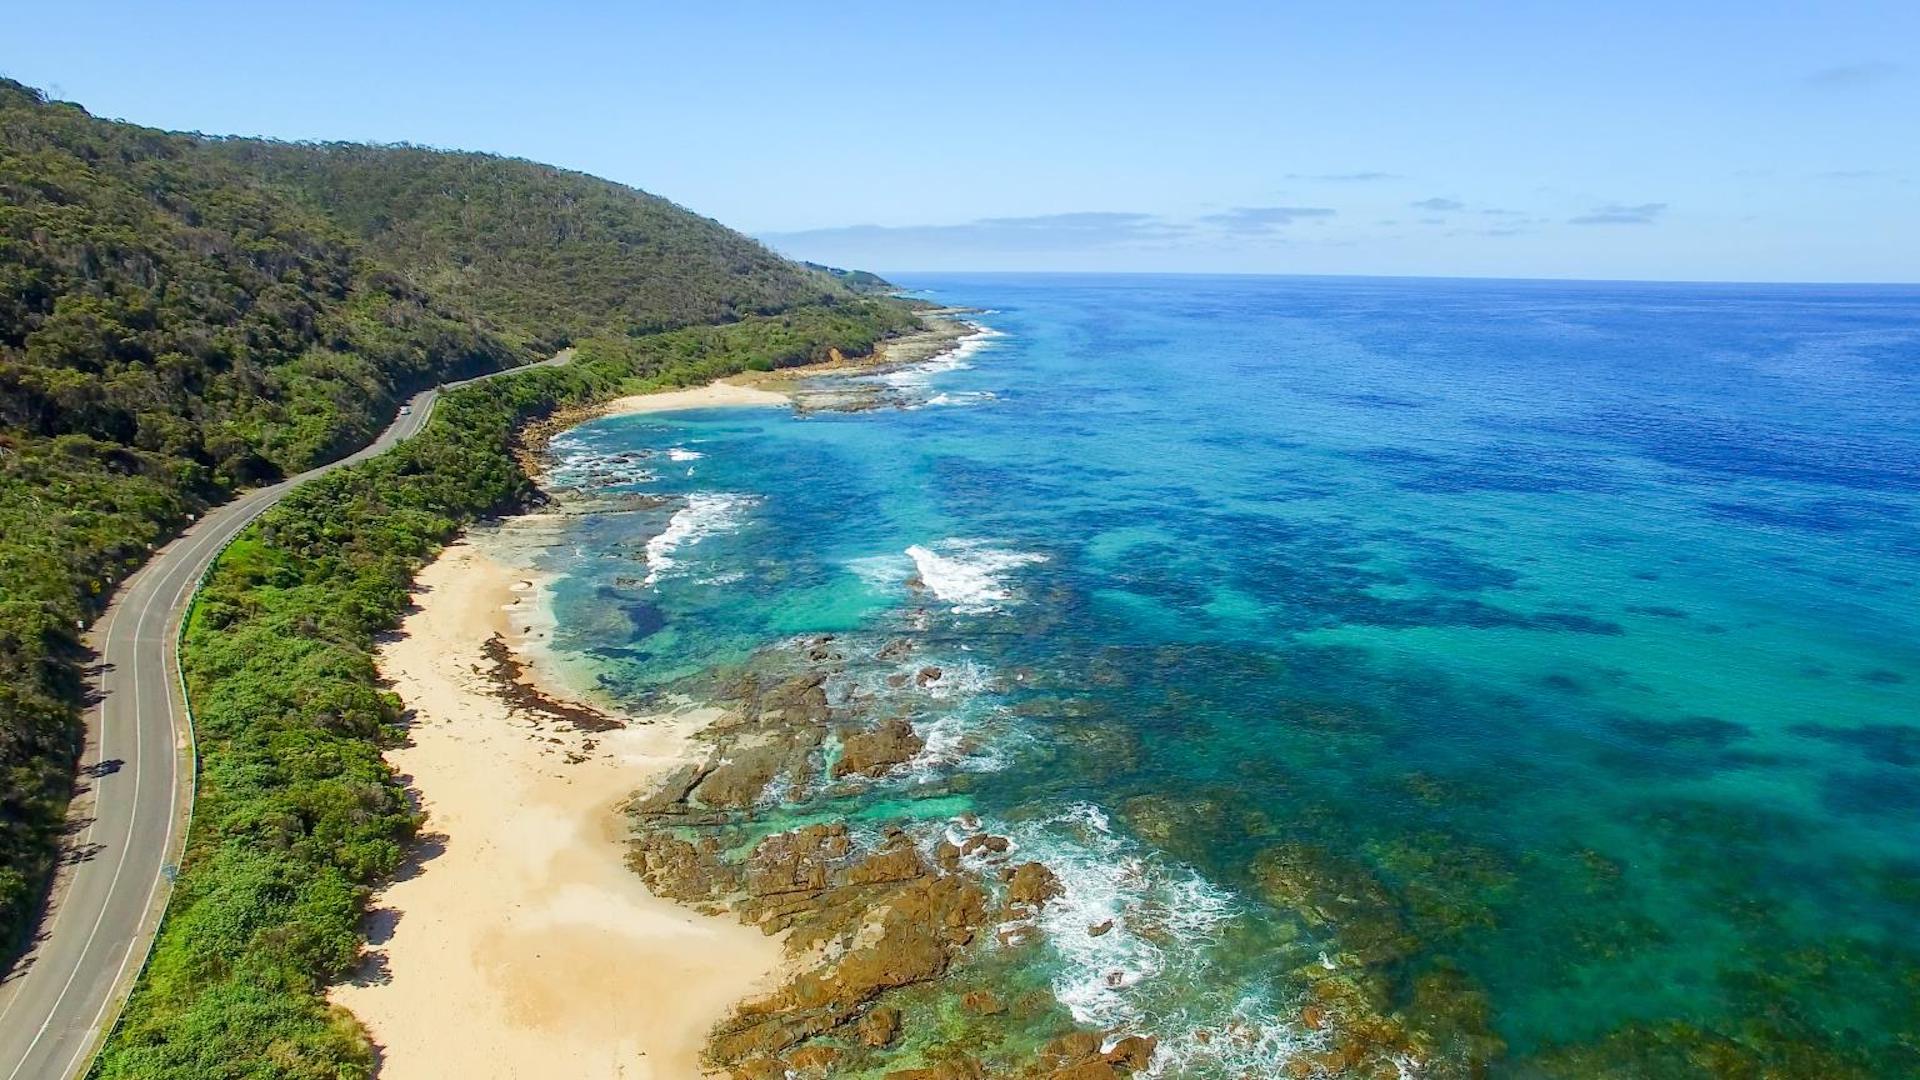 picture-10-great-ocean-road